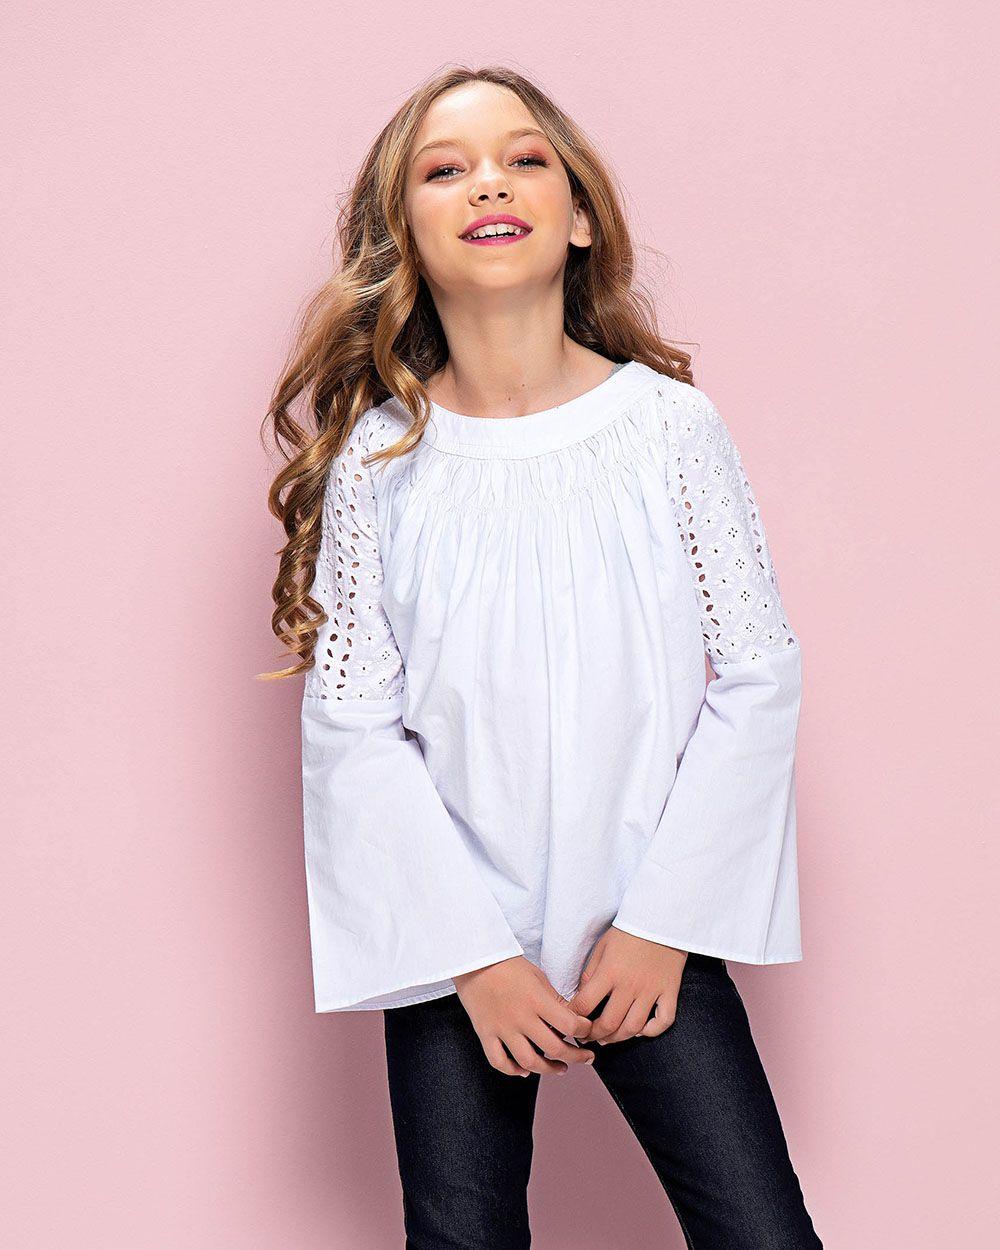 Camisa Menina Mania Kids Branca com Laise Manga 60903